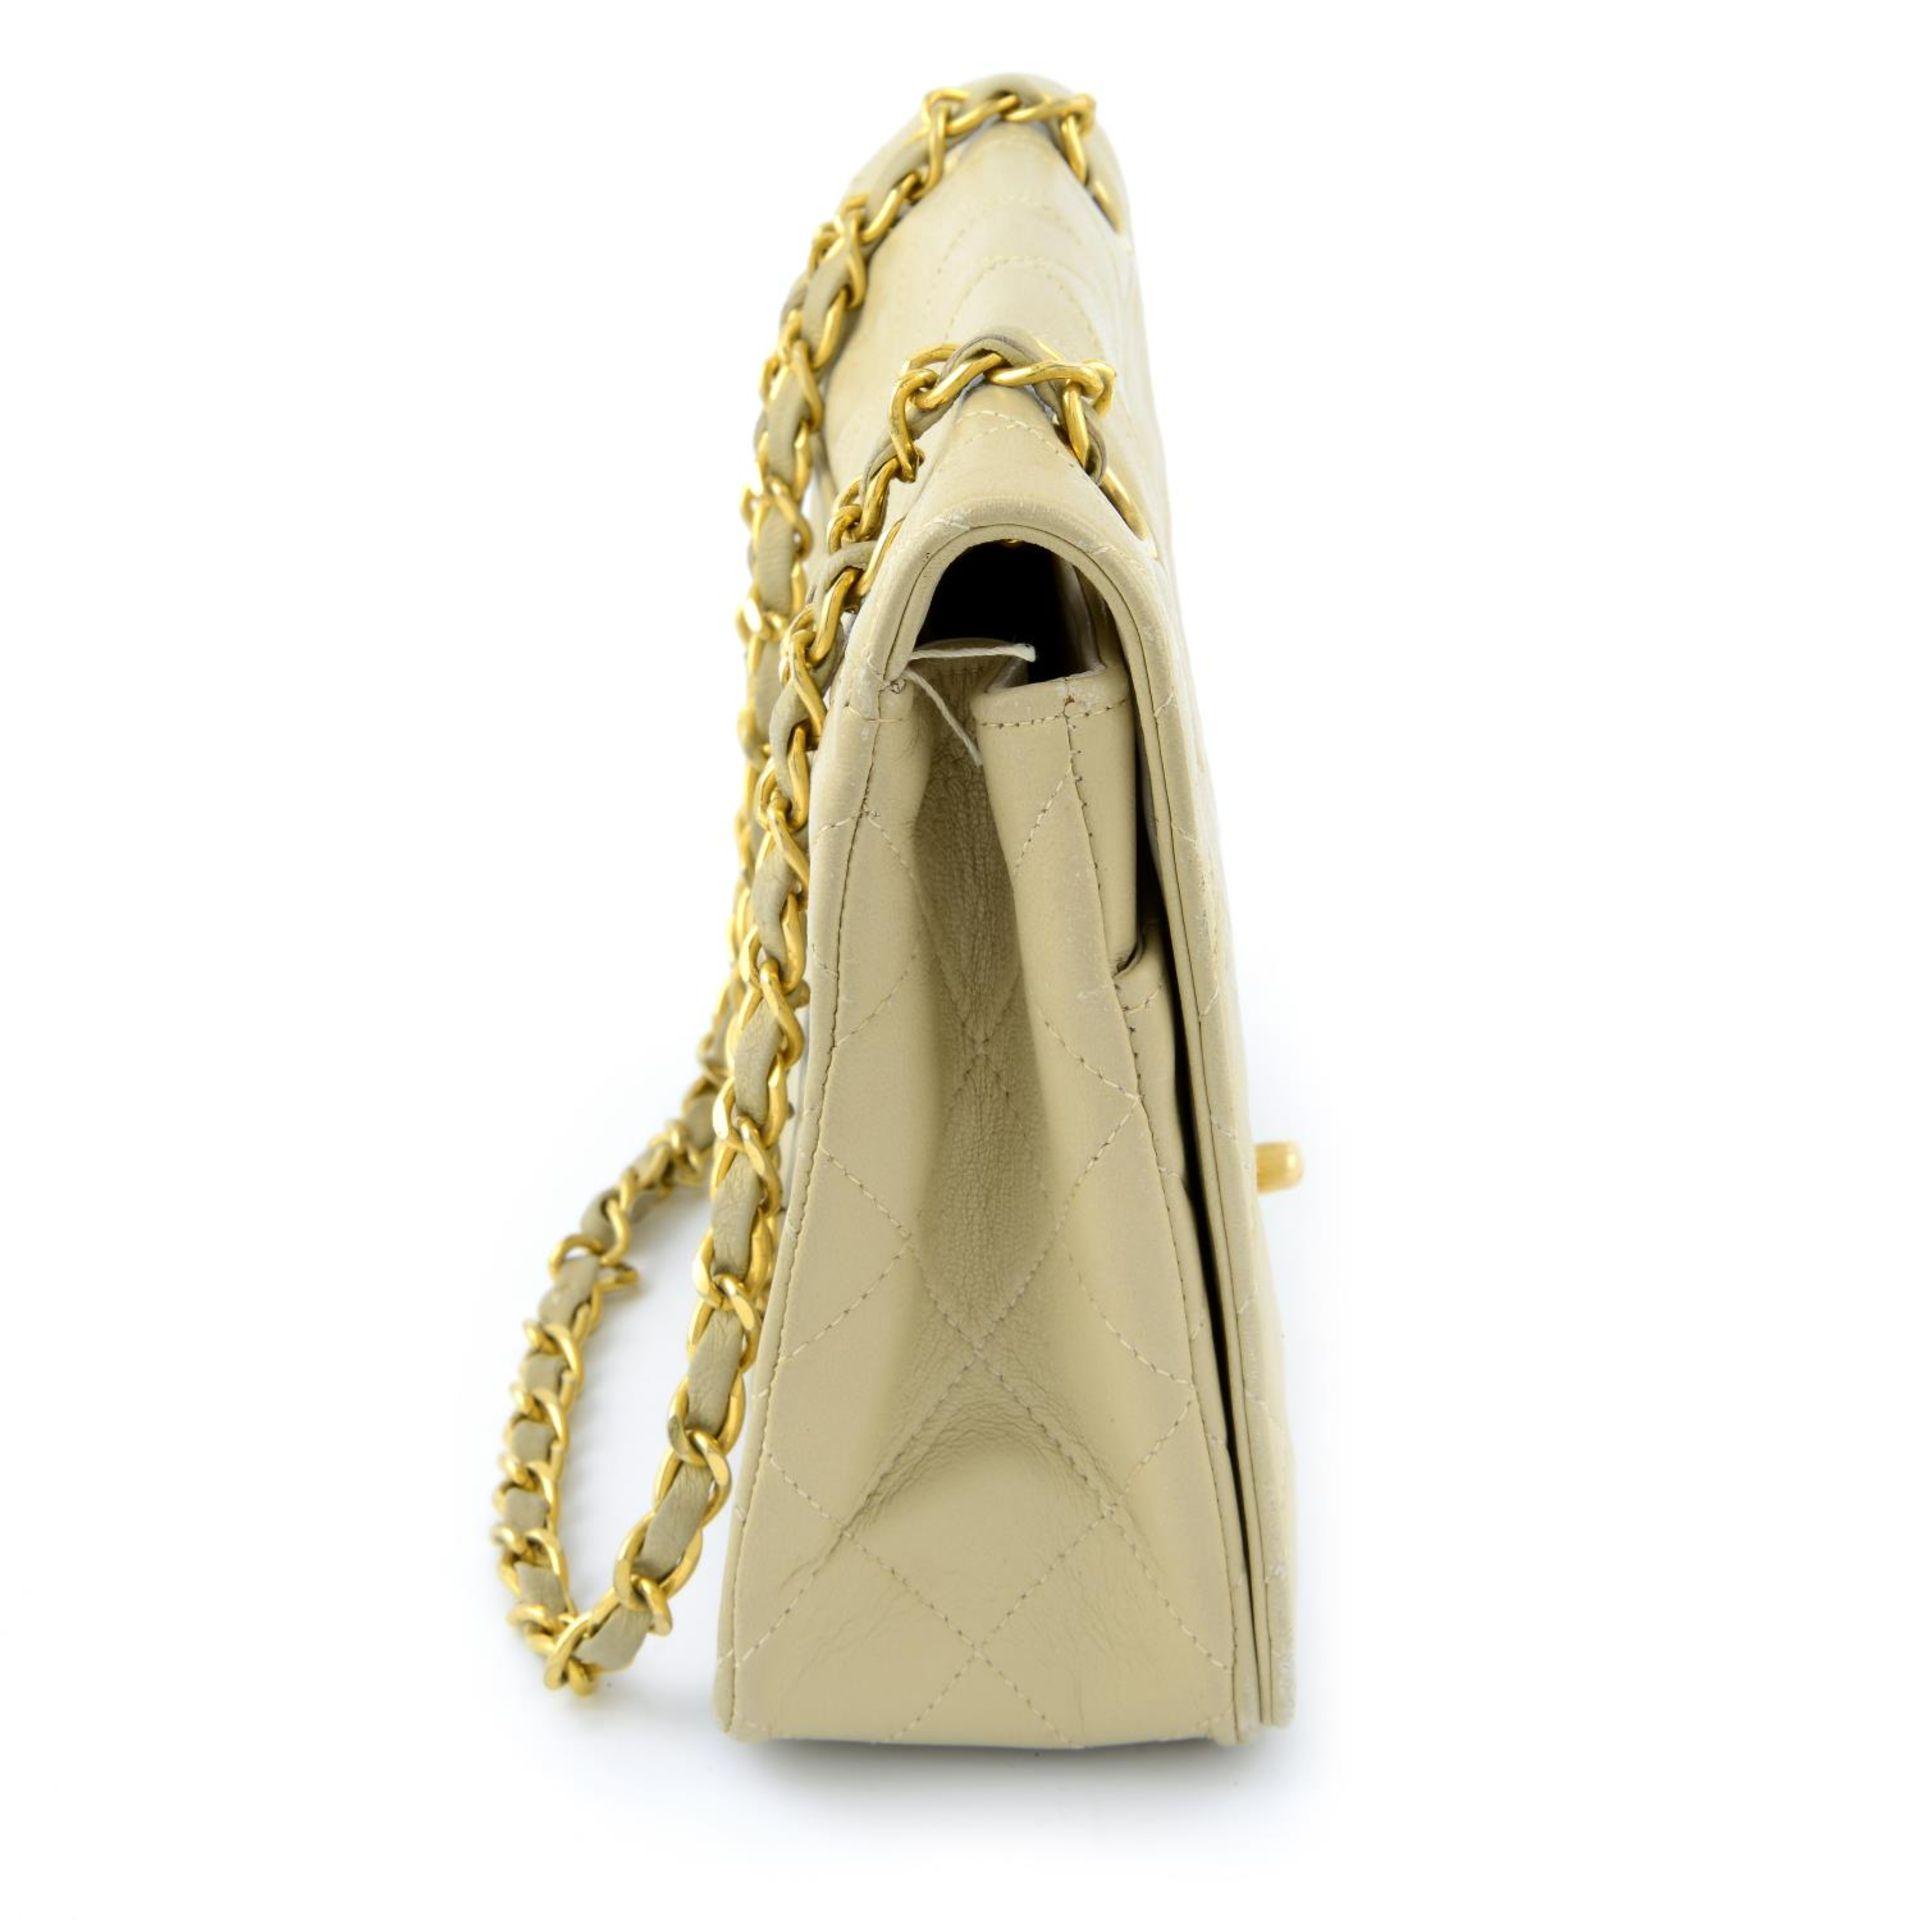 CHANEL - a nude vintage single flap handbag. - Image 3 of 5